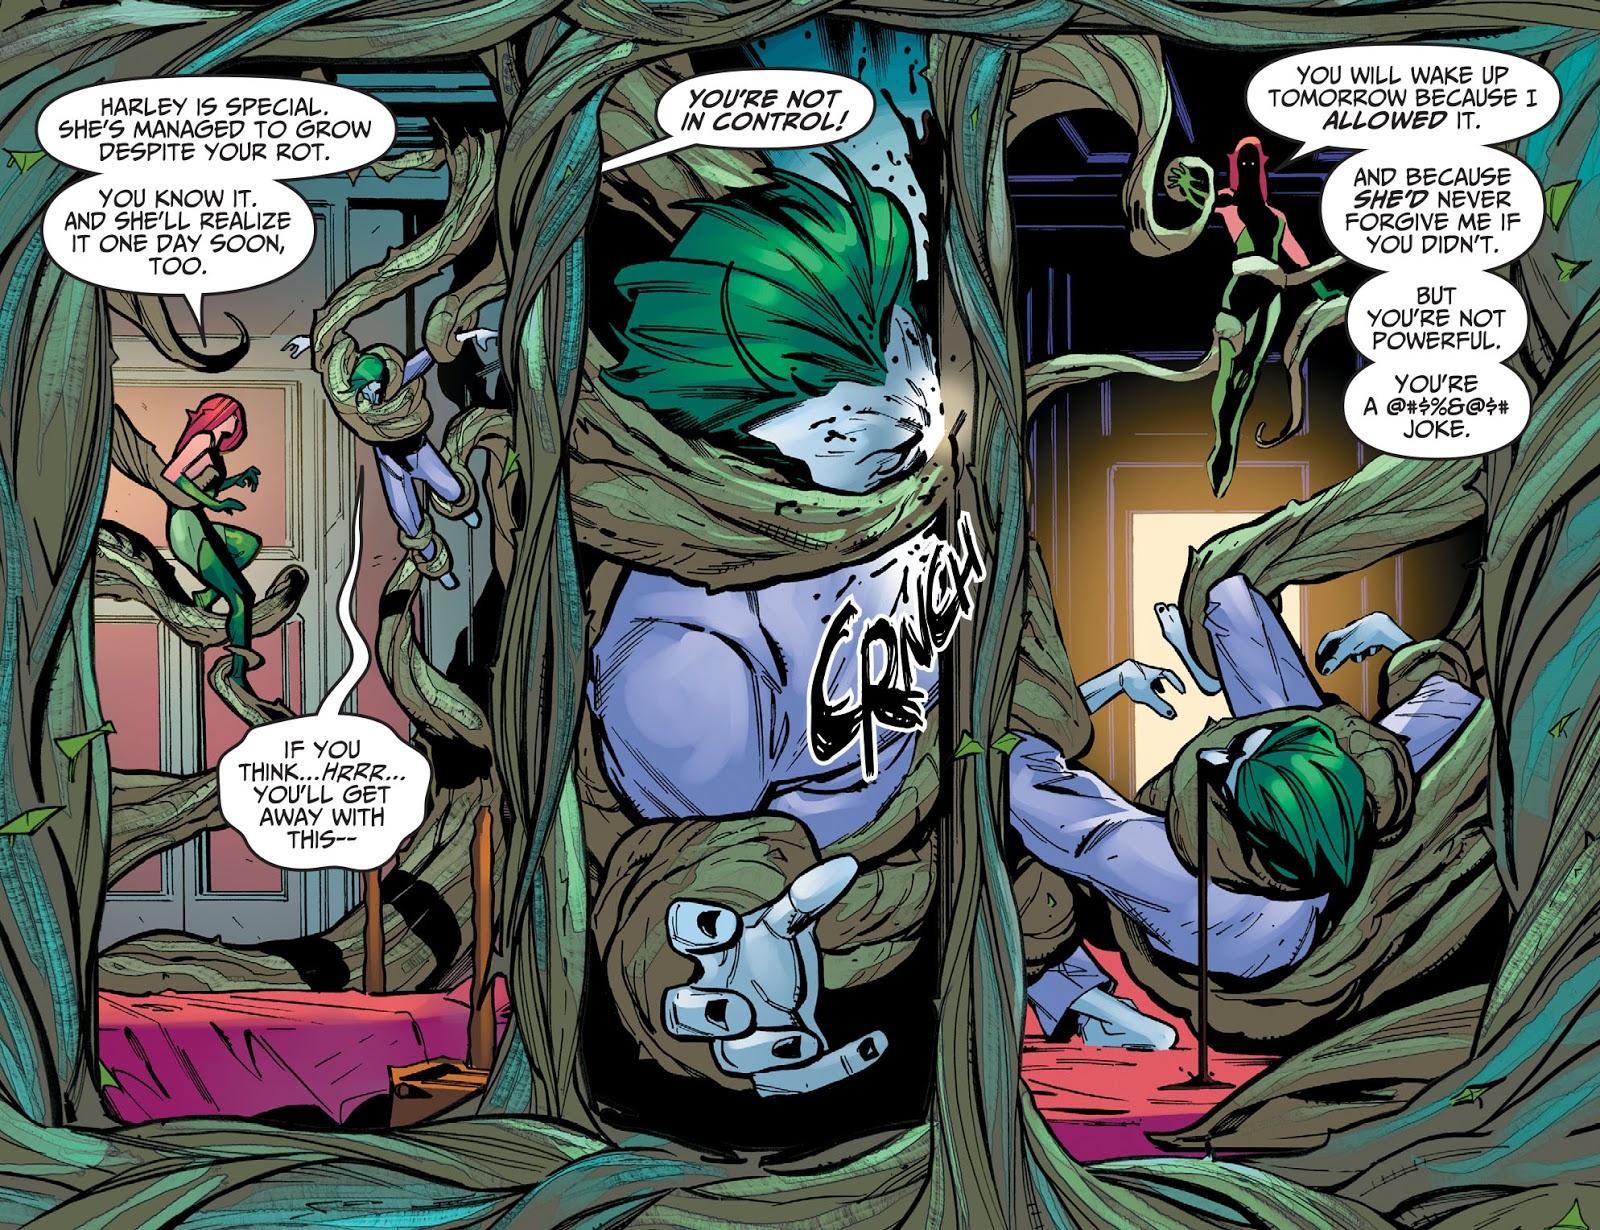 Poison Ivy Threatens The Joker (Injustice Gods Among Us)